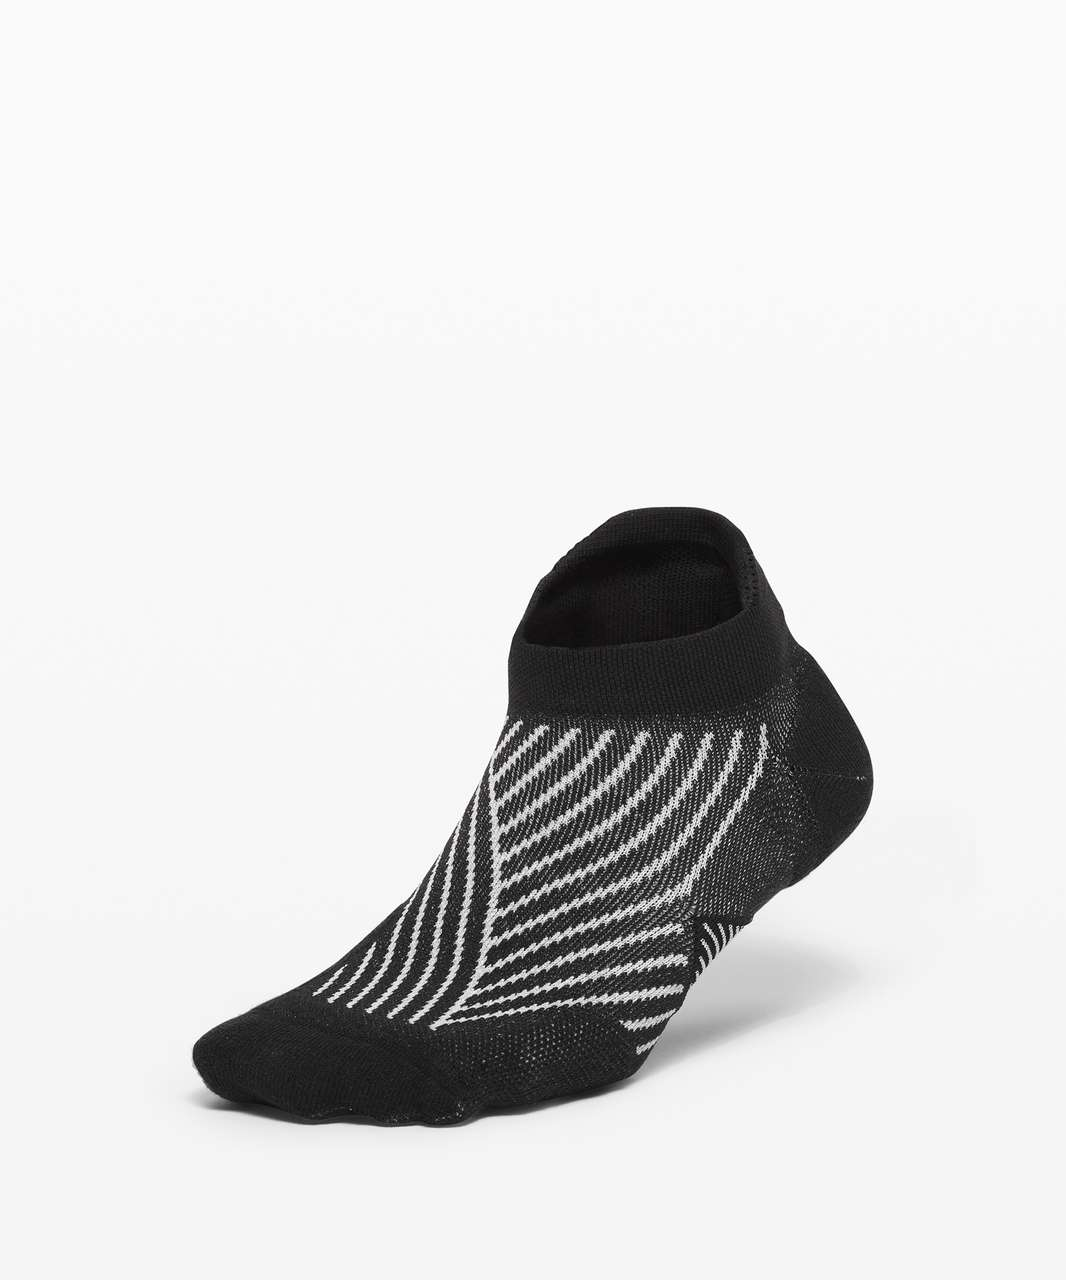 Lululemon Speed Sock *Silver - Light Cast / Black / Starlight